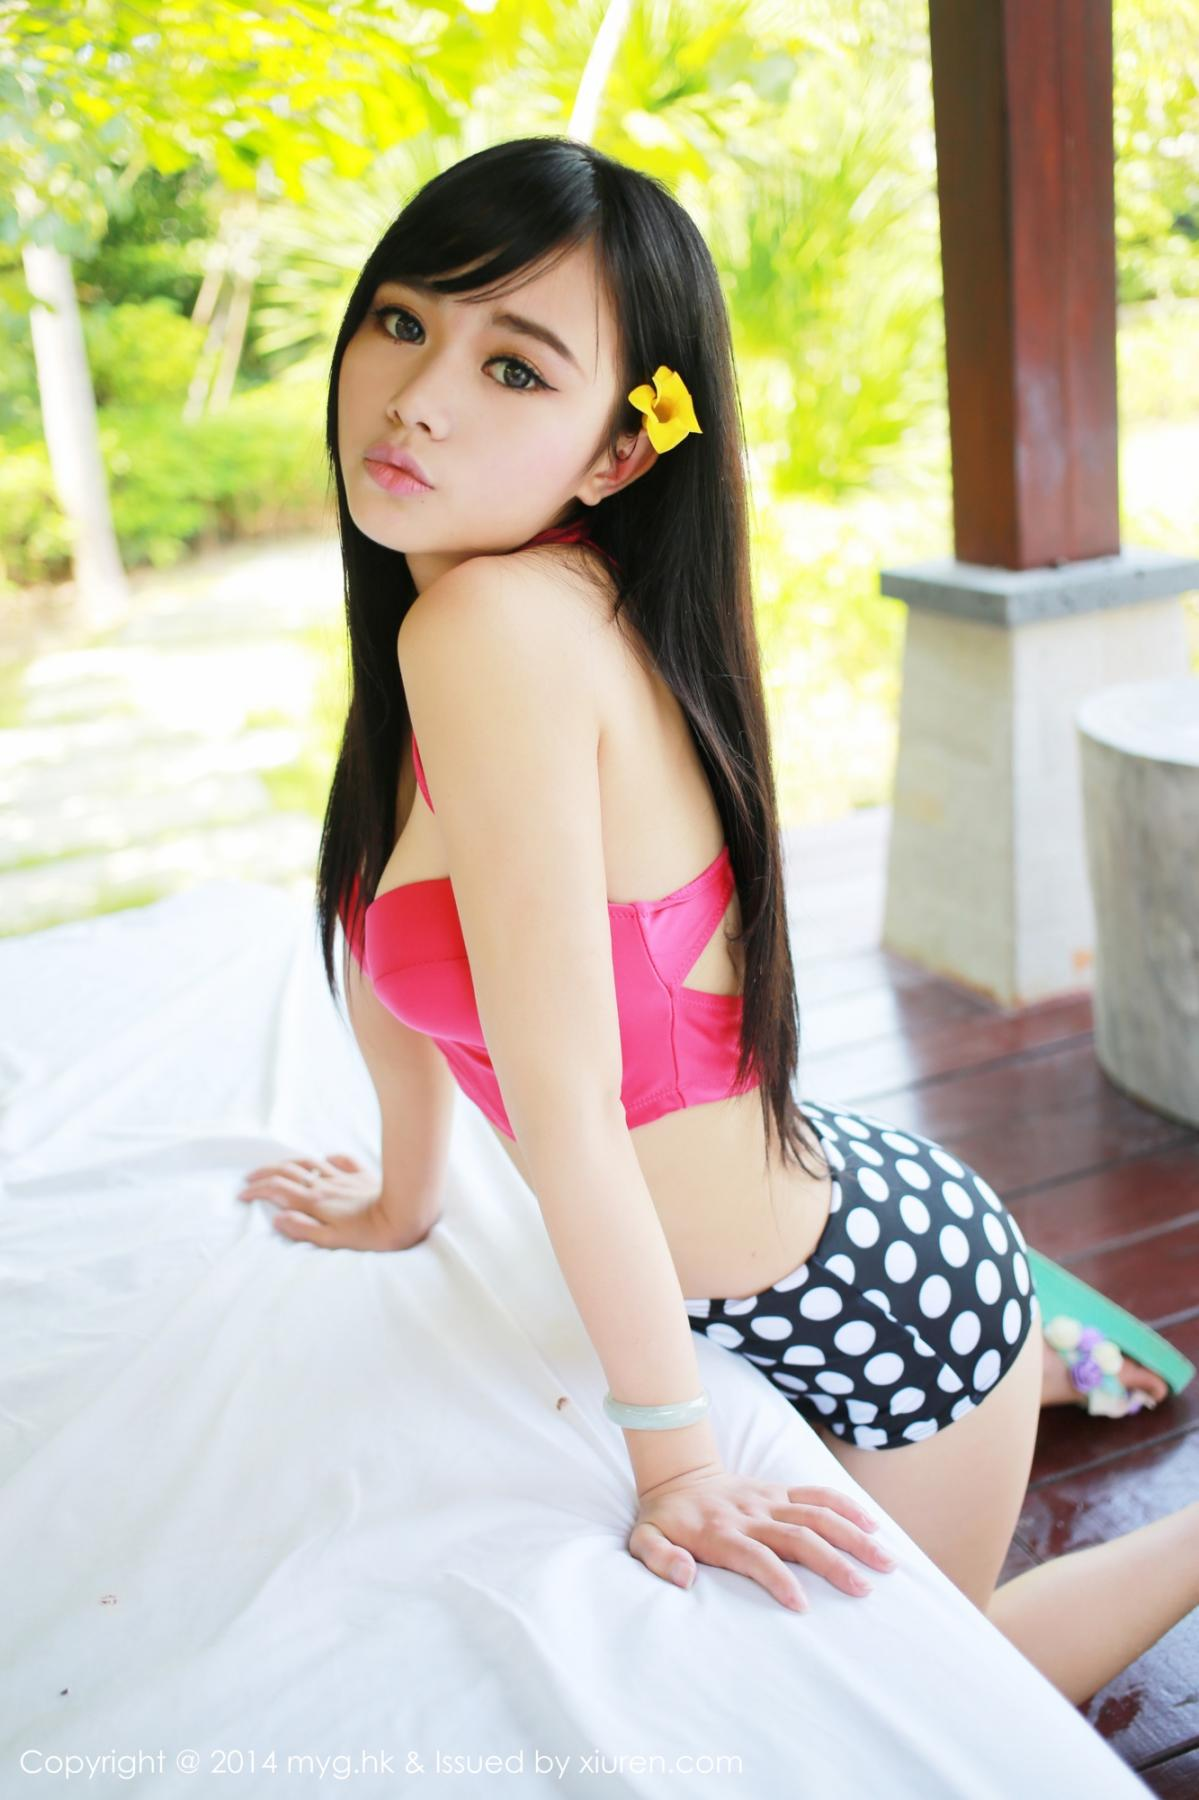 [MyGirl] Vol.012 Yu Zhu 76P, Lovely, Pure, Yu Zhu